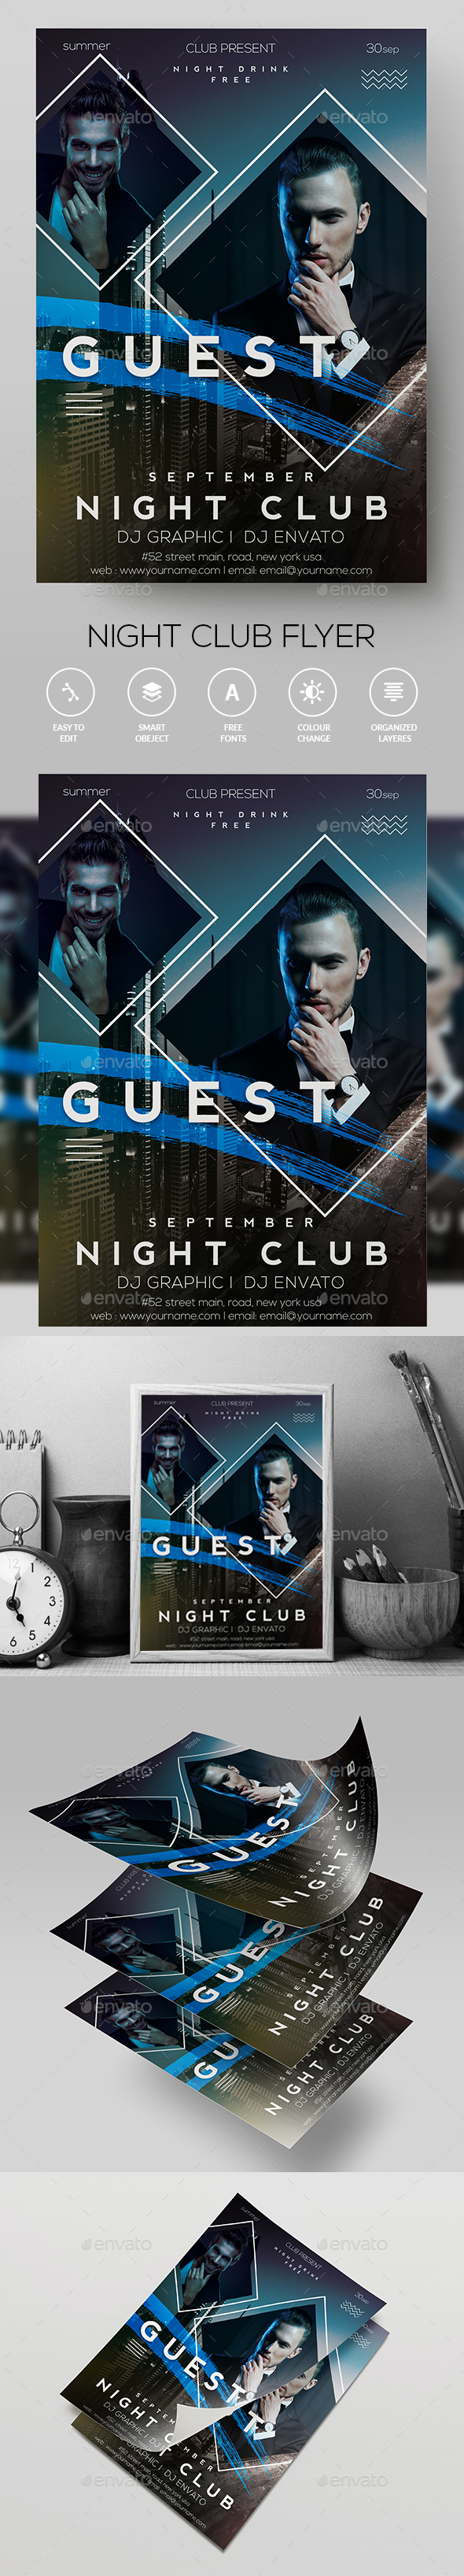 DJ  Club FLyer - Clubs & Parties Events